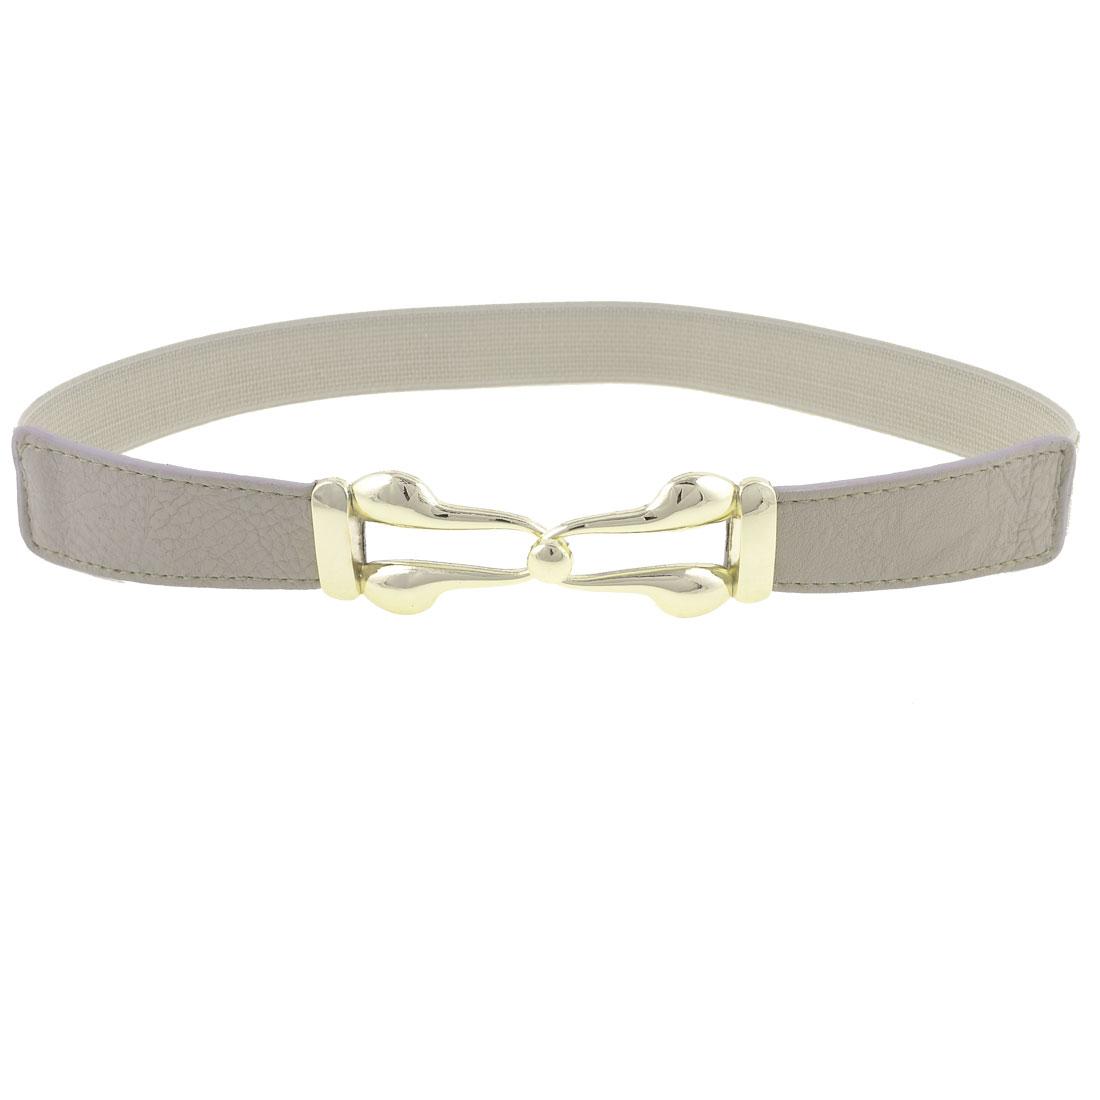 Lady Metal Interlock Buckle Faux Leather Decor Stretch Waist Belt Gray